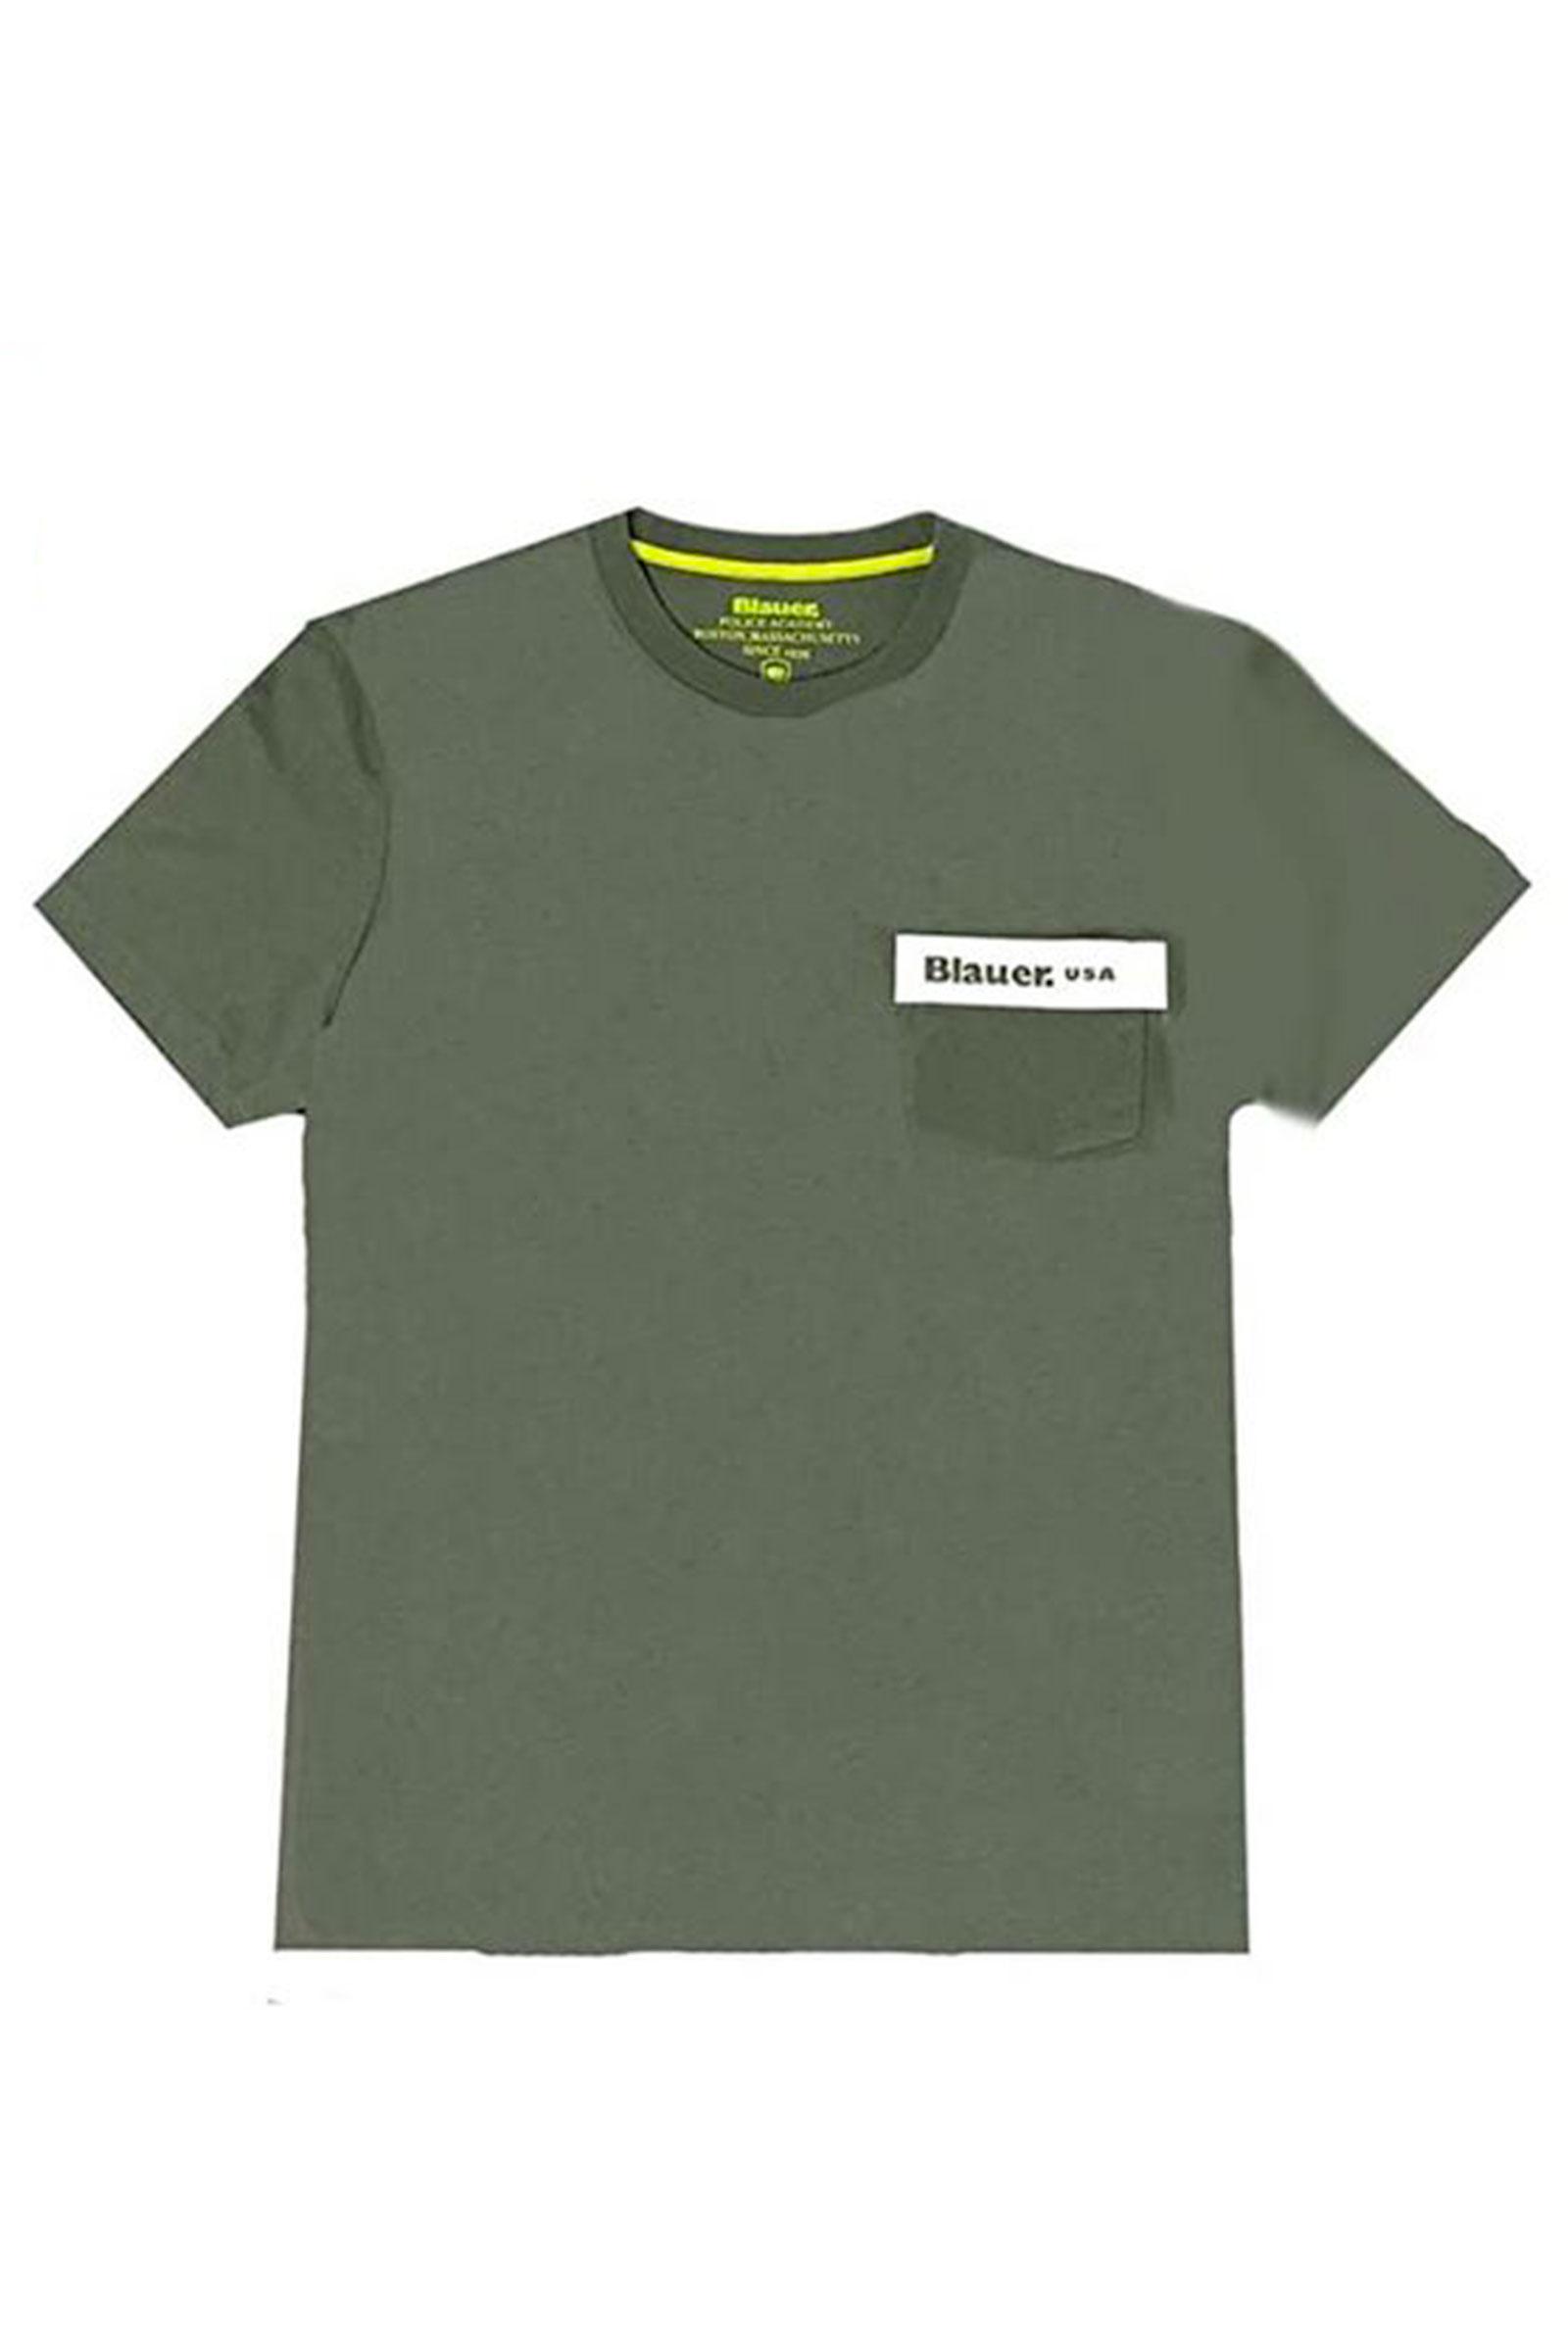 BLAUER Men's T-Shirt BLAUER | T-Shirt | 21SBLUH02136702